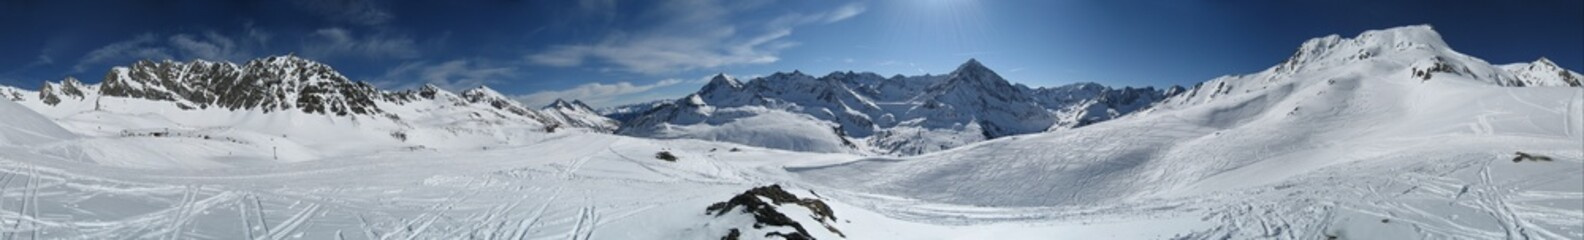 Winterpanorama aus Tirol